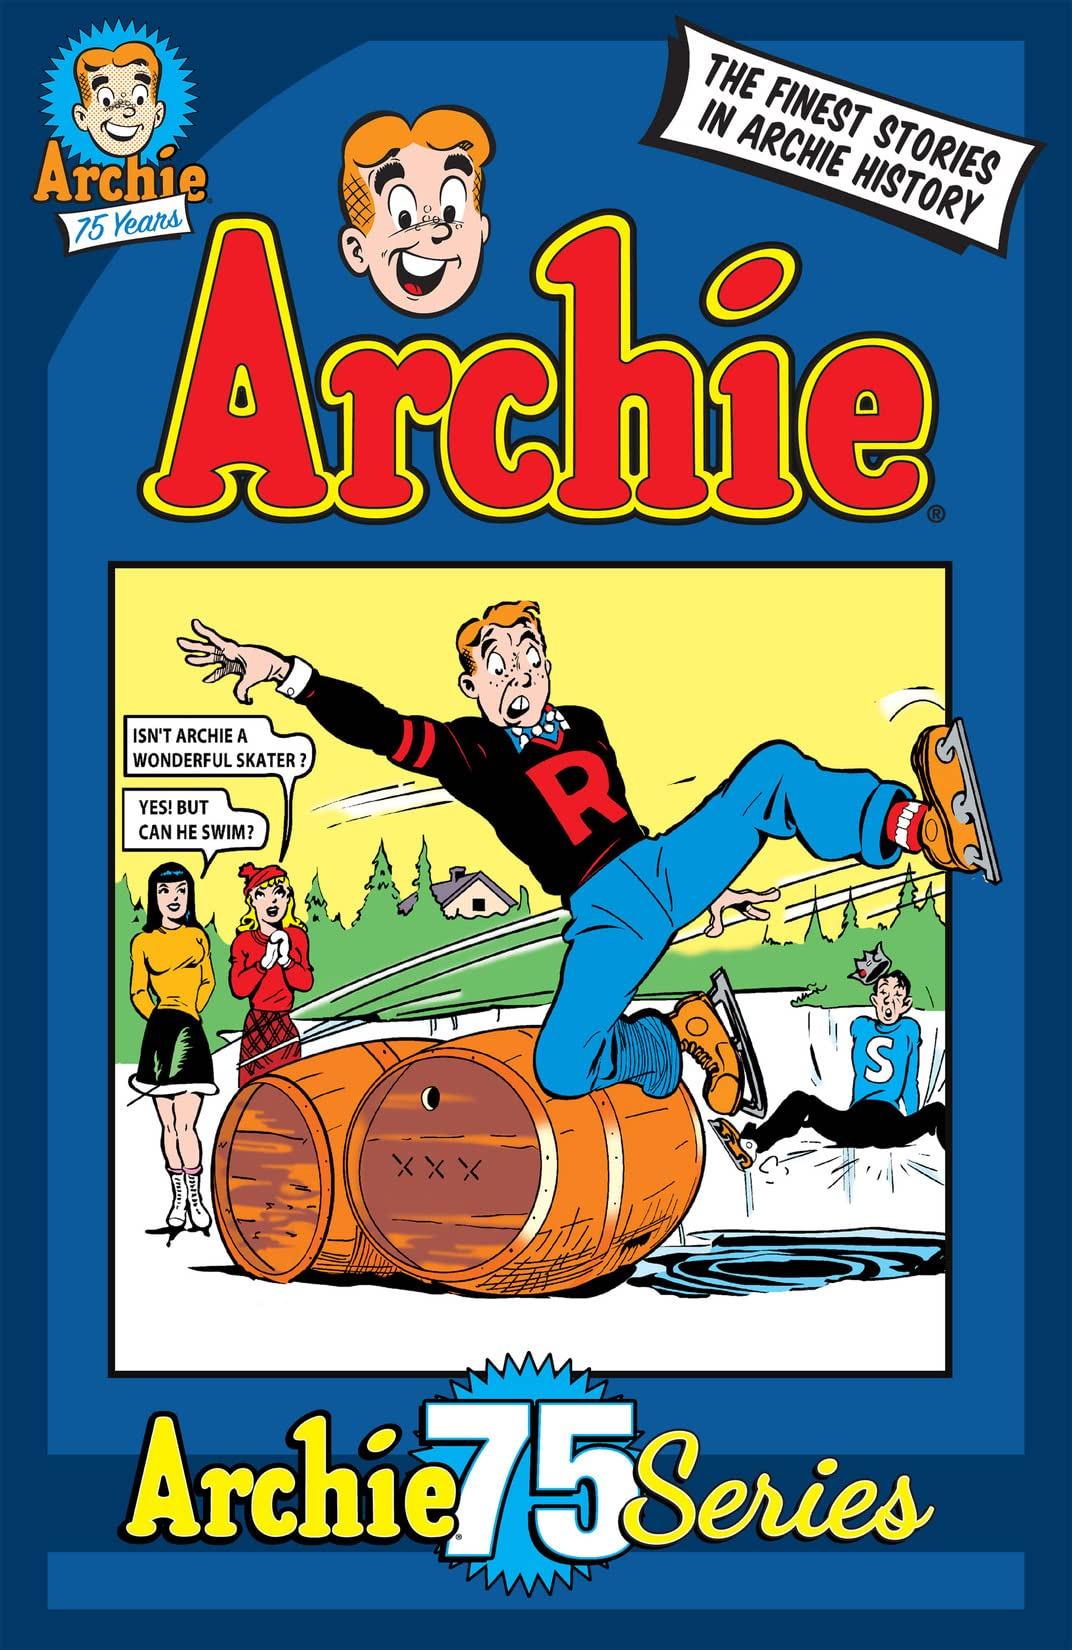 Archie 75 Series #1: Archie